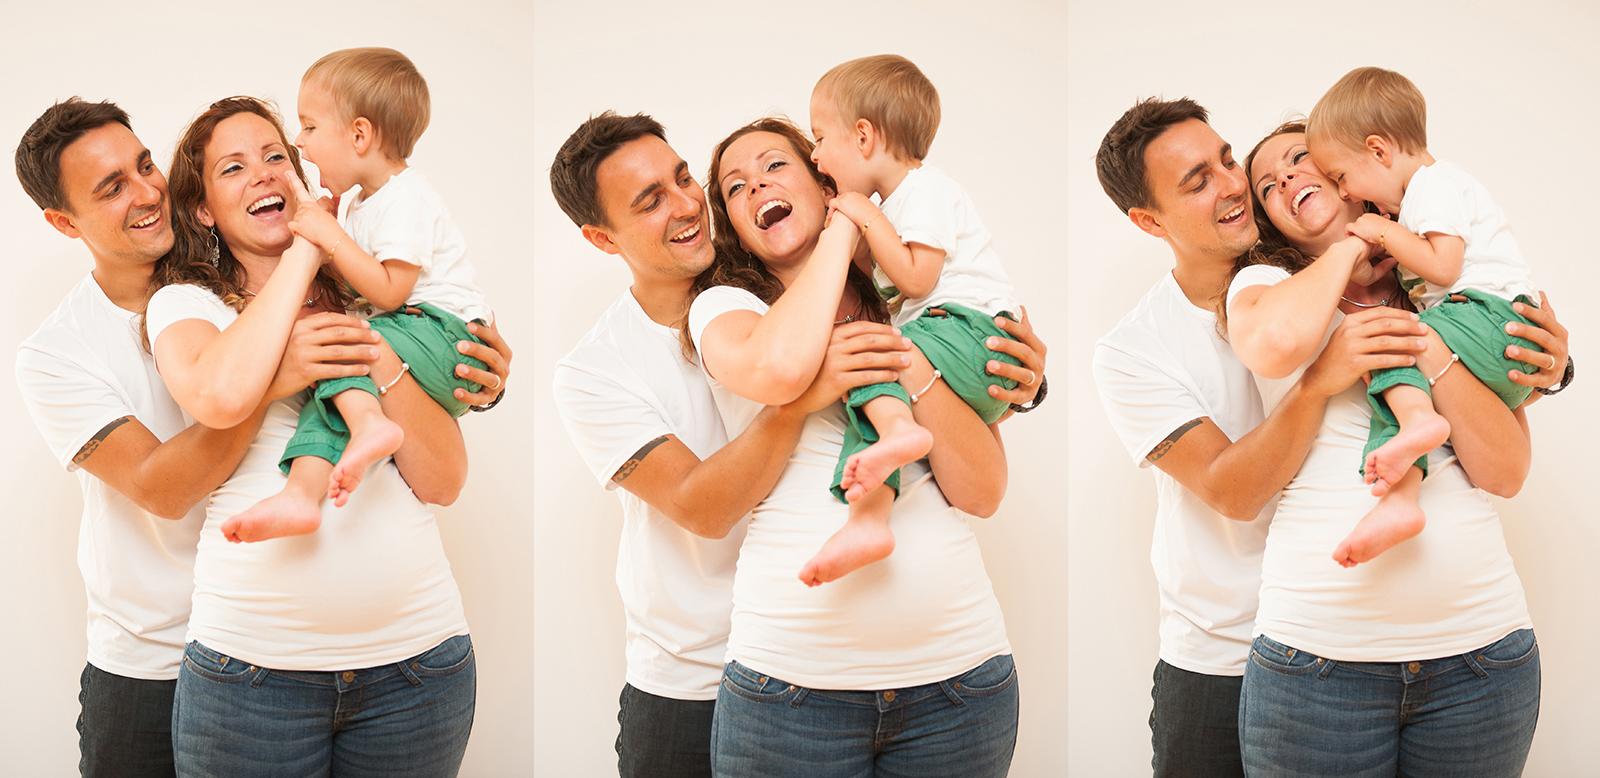 seance-photo-famille-photo-grossesse-photo-bébé-naissance-sabrina-godemert-photographe-seine-et-marne006